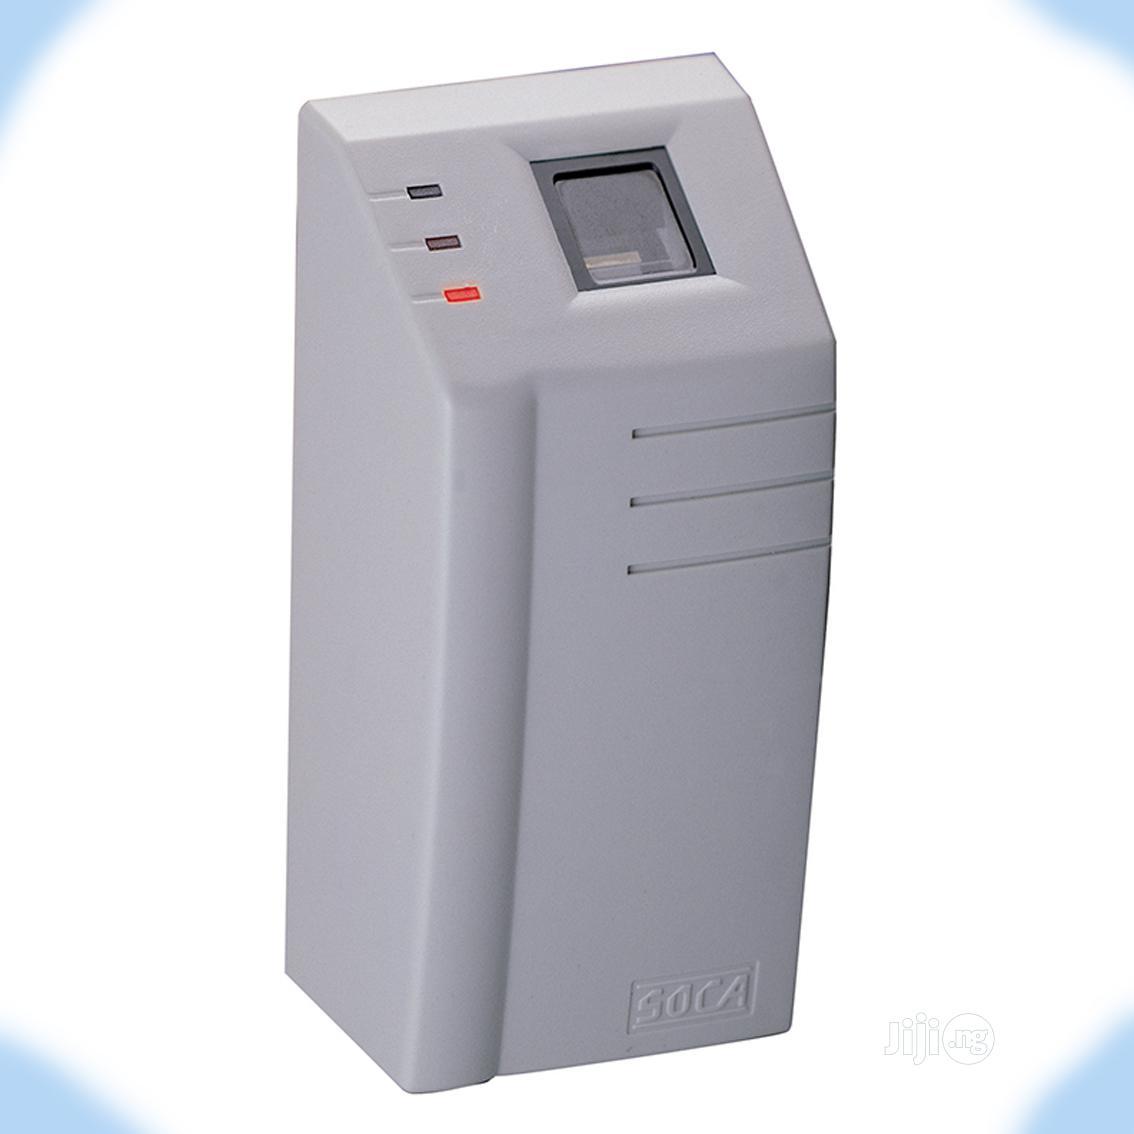 Archive: ACCESS CONTROL SOCA Stand-alone Fingerprint Access Control Reader